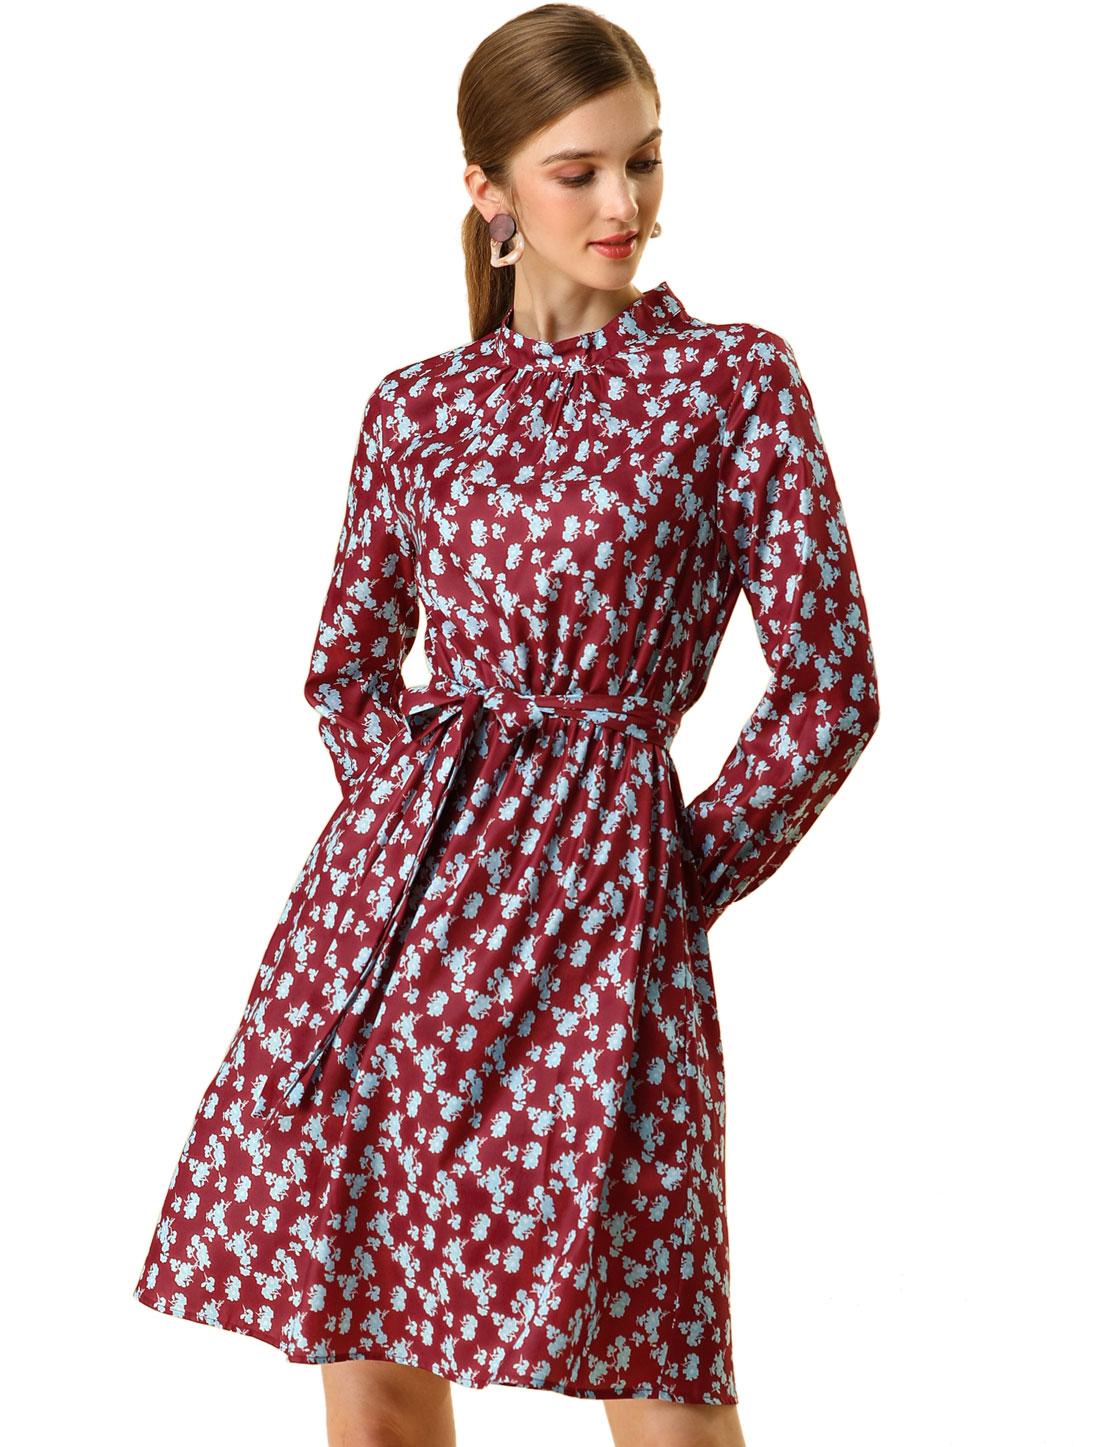 Allegra K Women's Floral Flare Long Sleeve Tie Waist A-line Dress Red XS